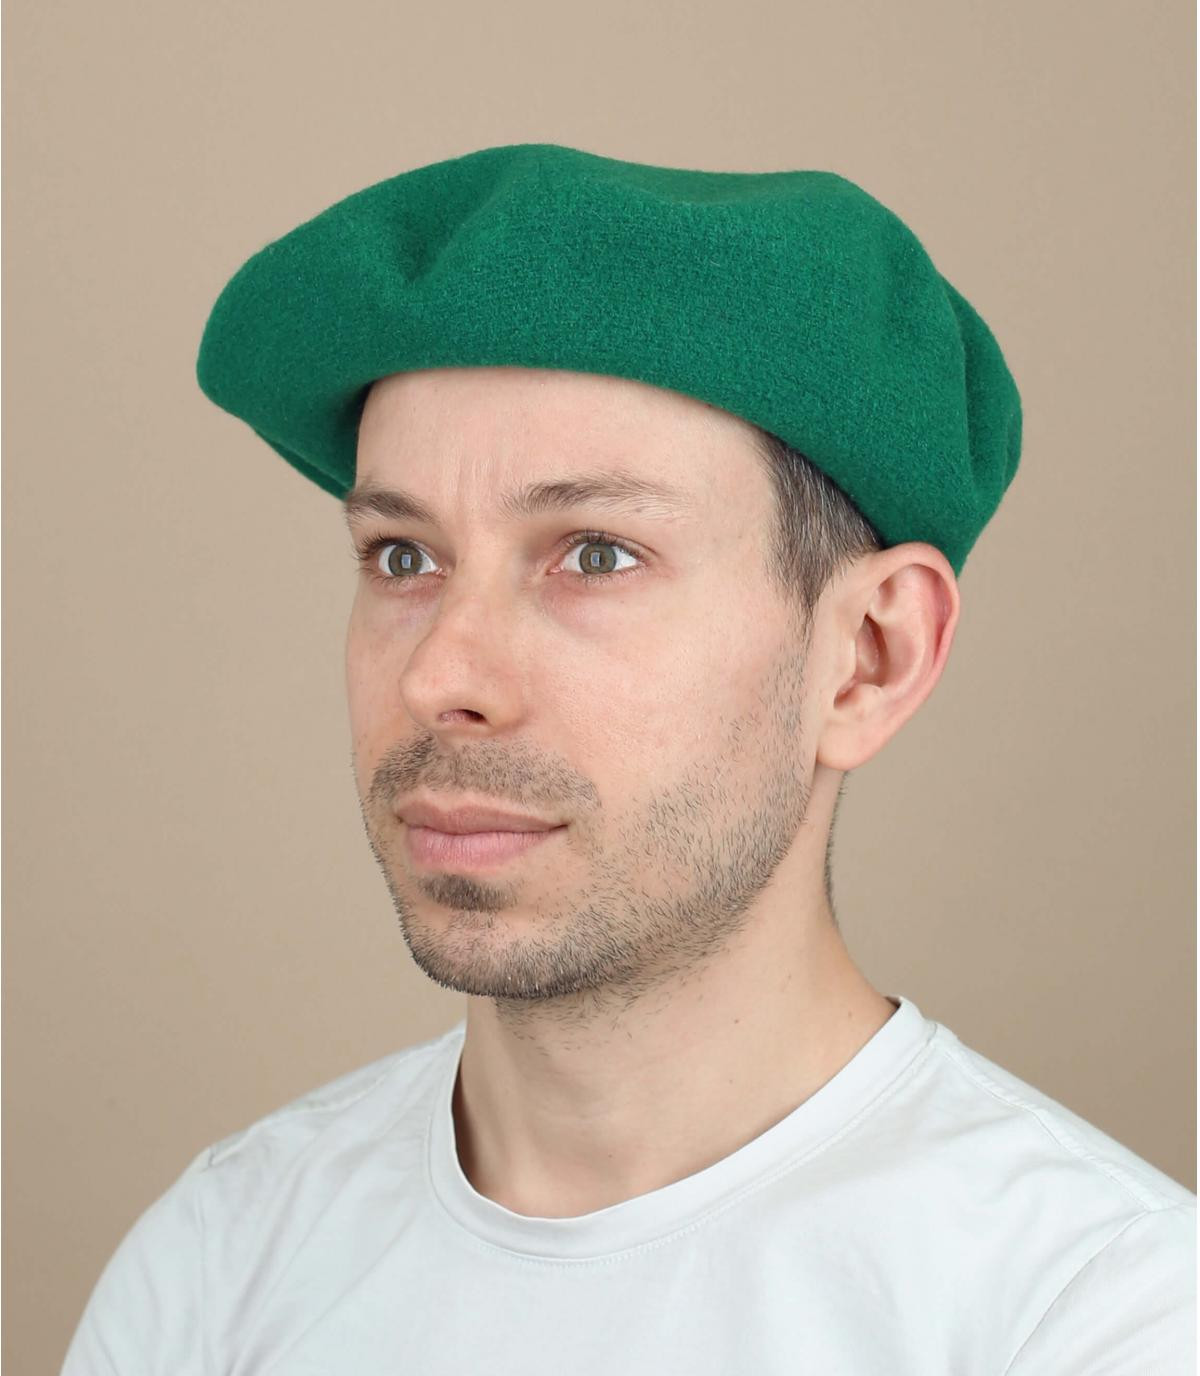 Gorro hombre verde